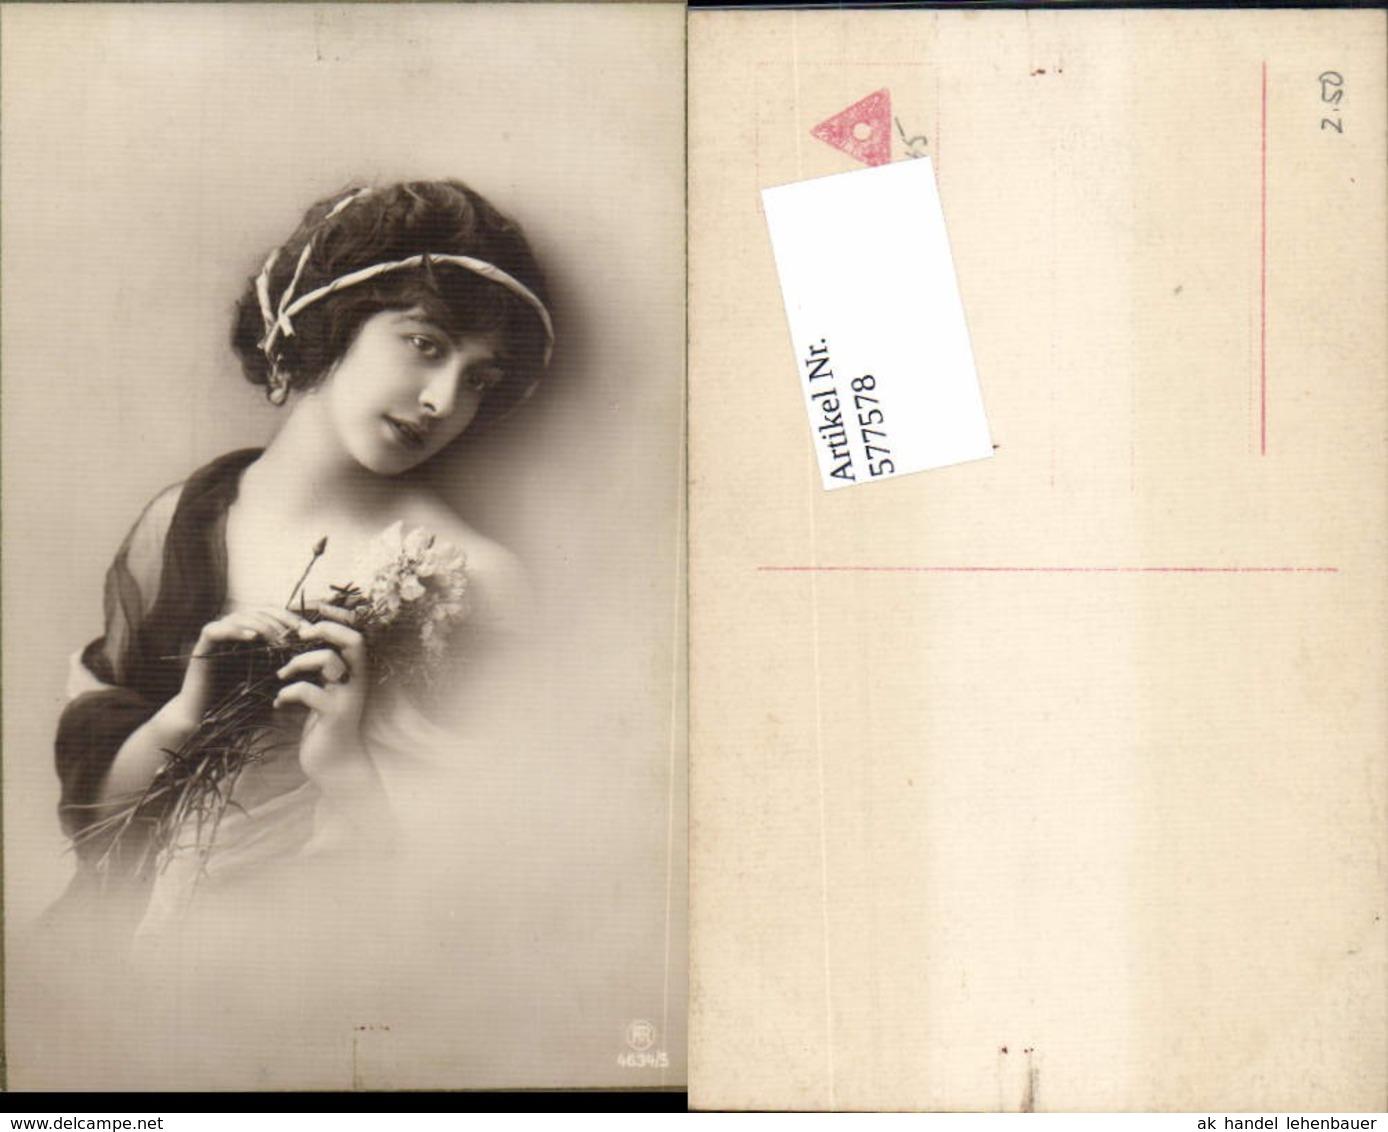 577578,Foto-AK Frau Erotik Risque Haarschmuck Pub RPH 4634/5 - Erotik Bis 1960 (nur Erwachsene)